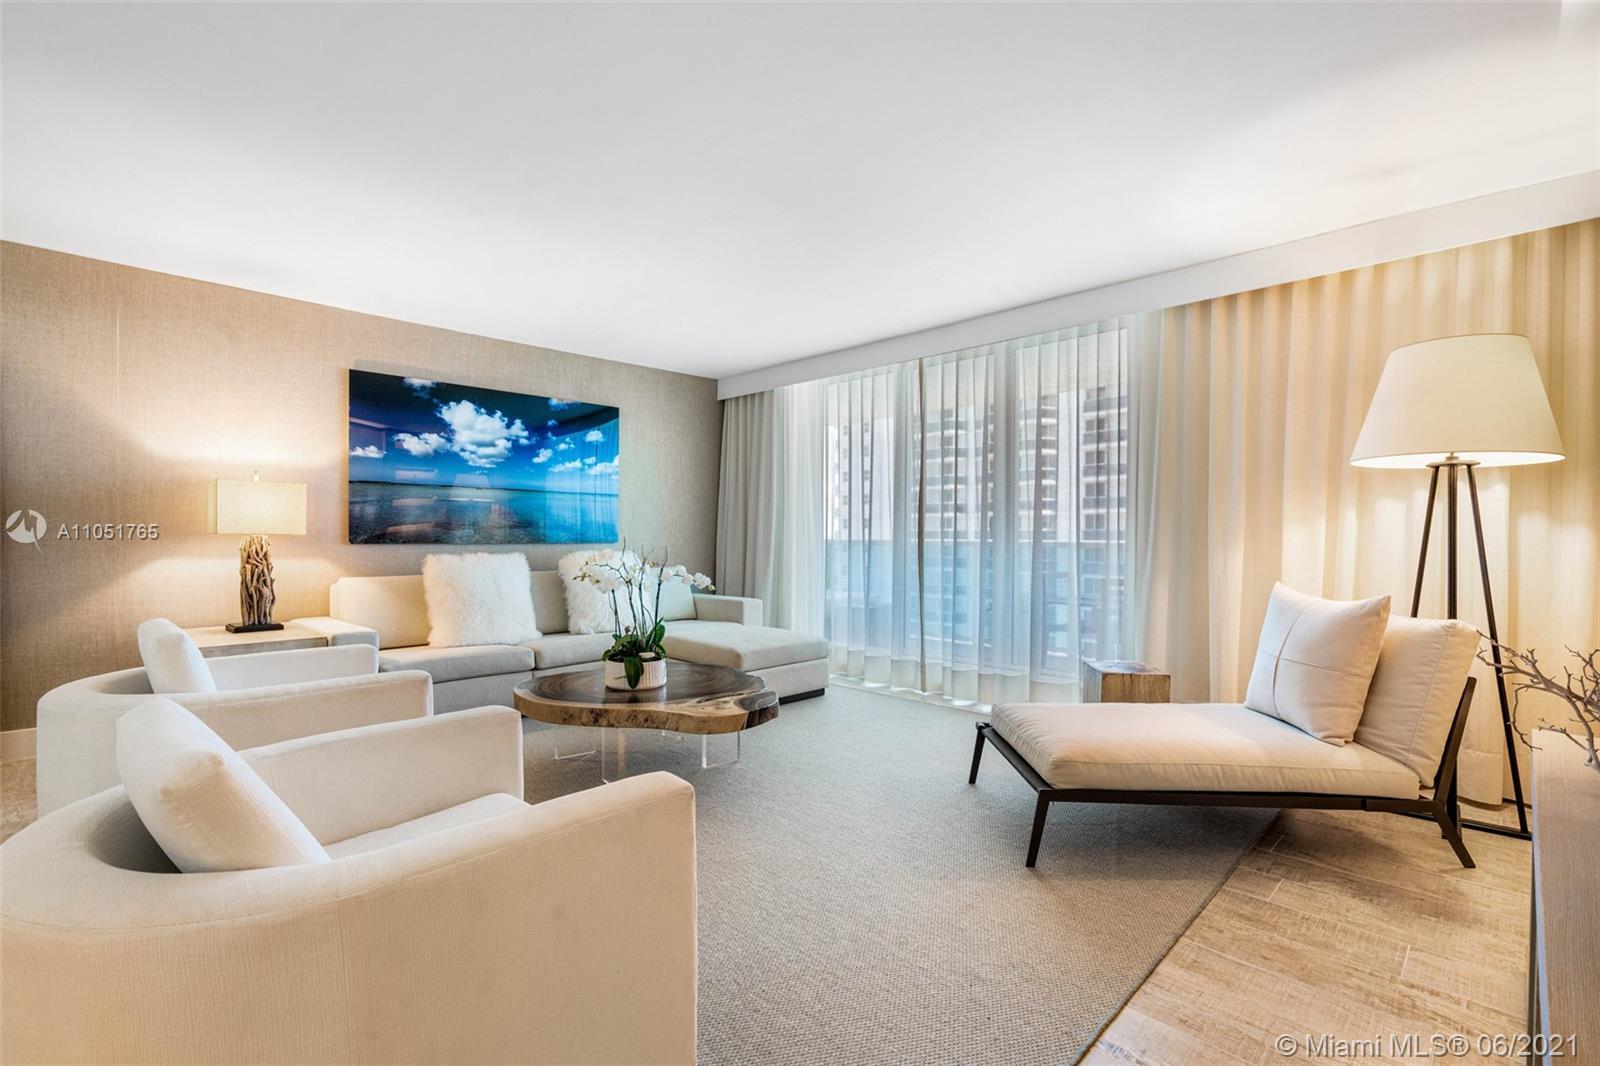 1 Hotel & Homes #1115 - 102 24th St #1115, Miami Beach, FL 33139